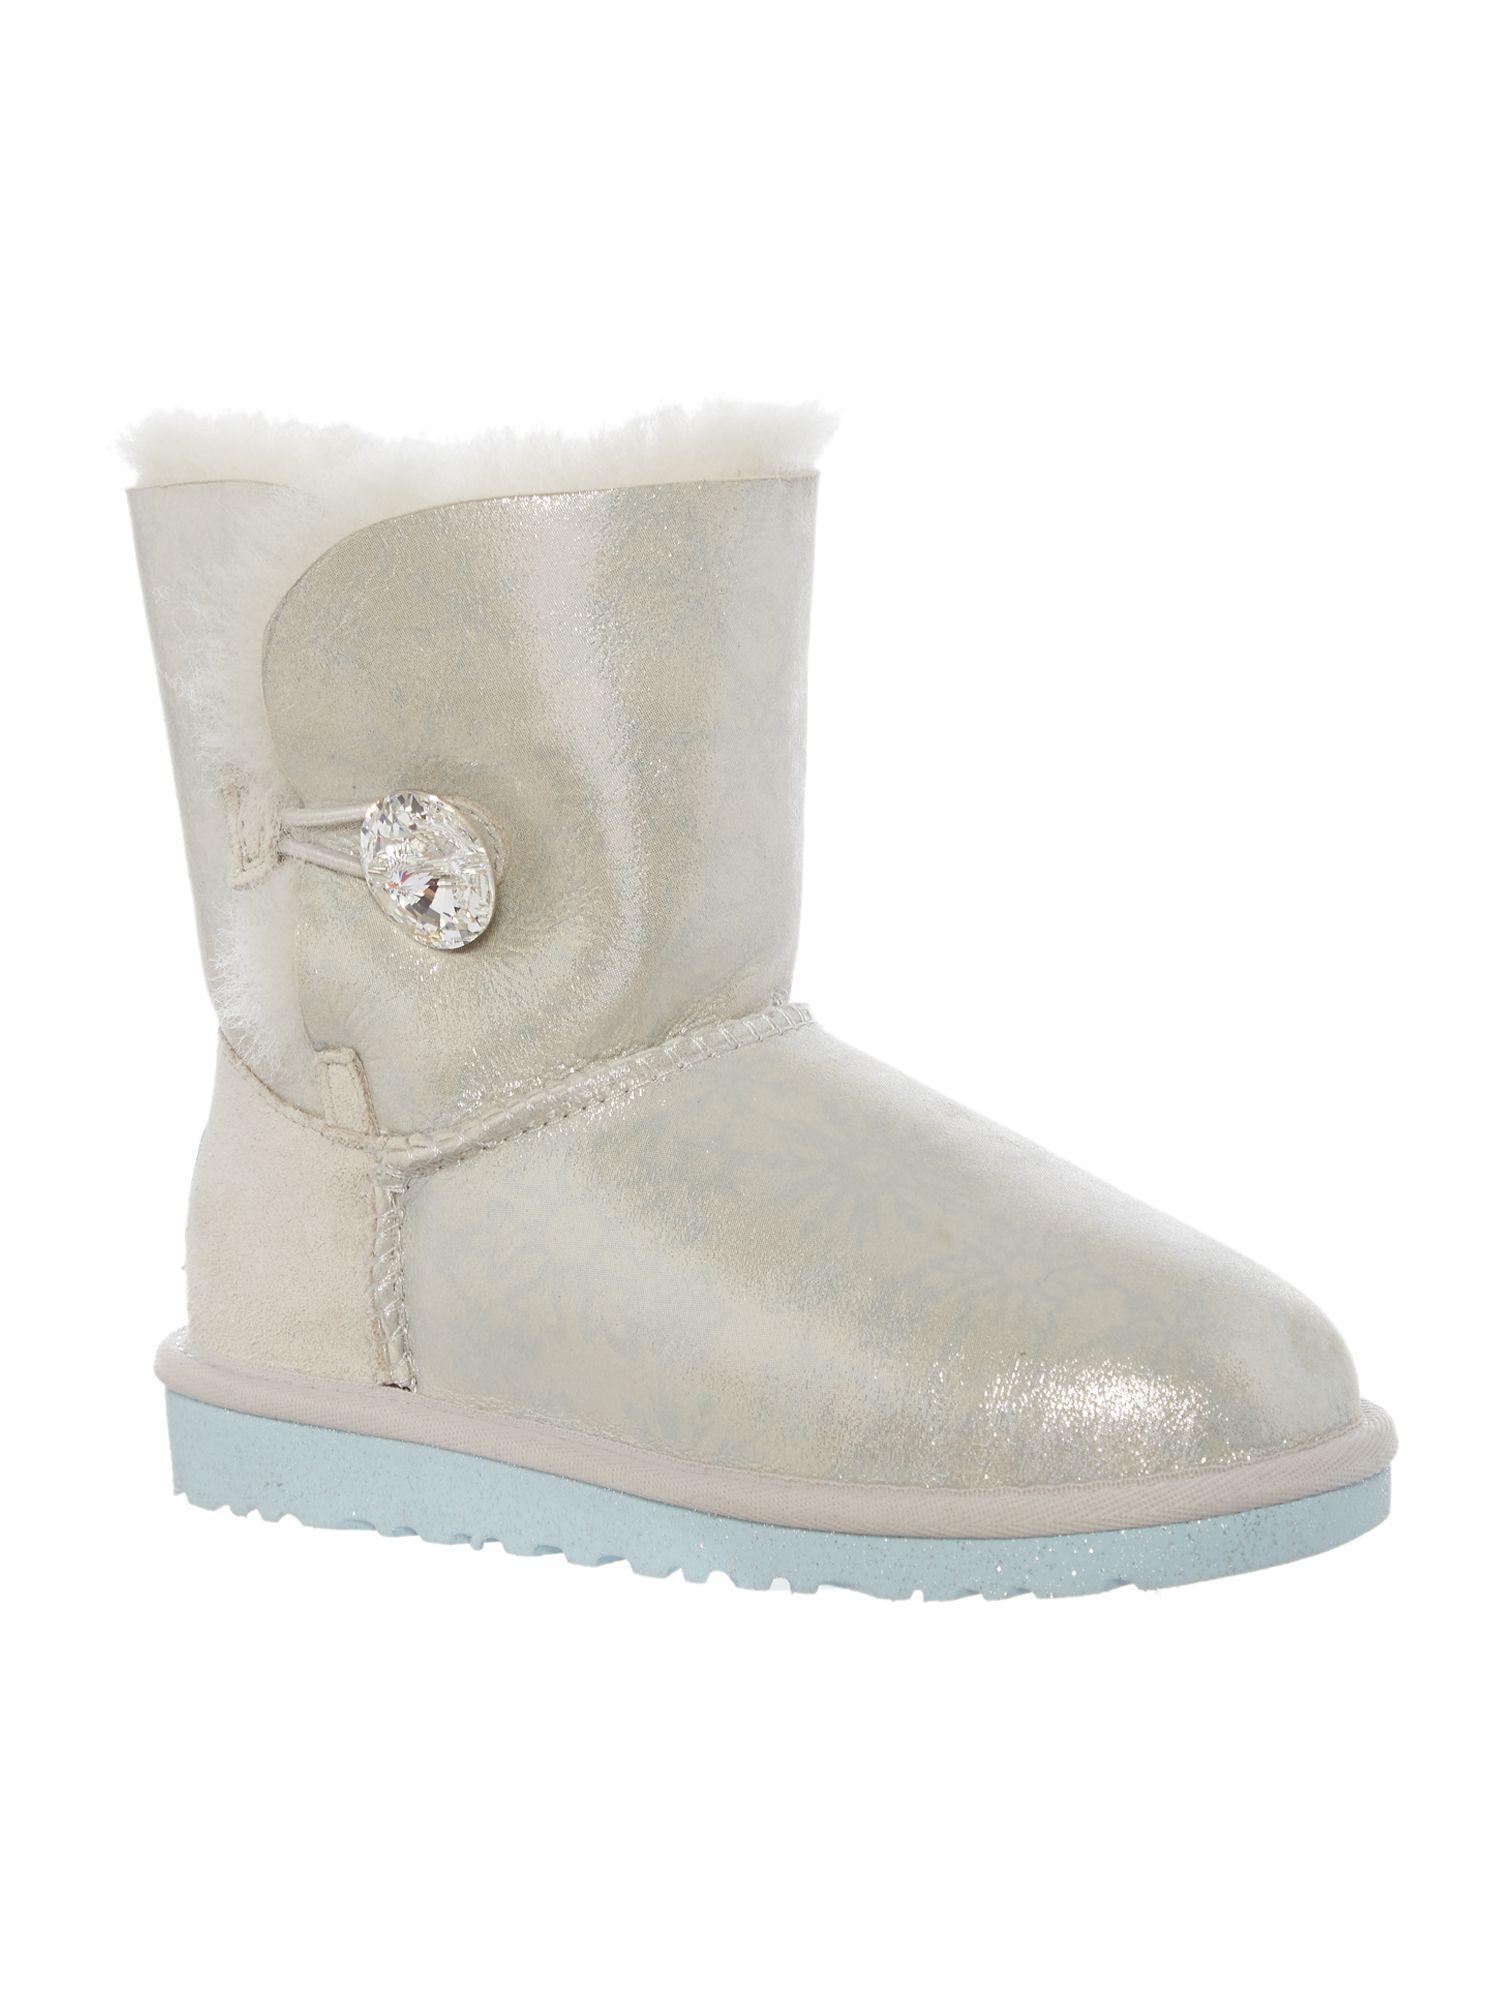 UGG. Women's White Girls Frozen Disney Boots